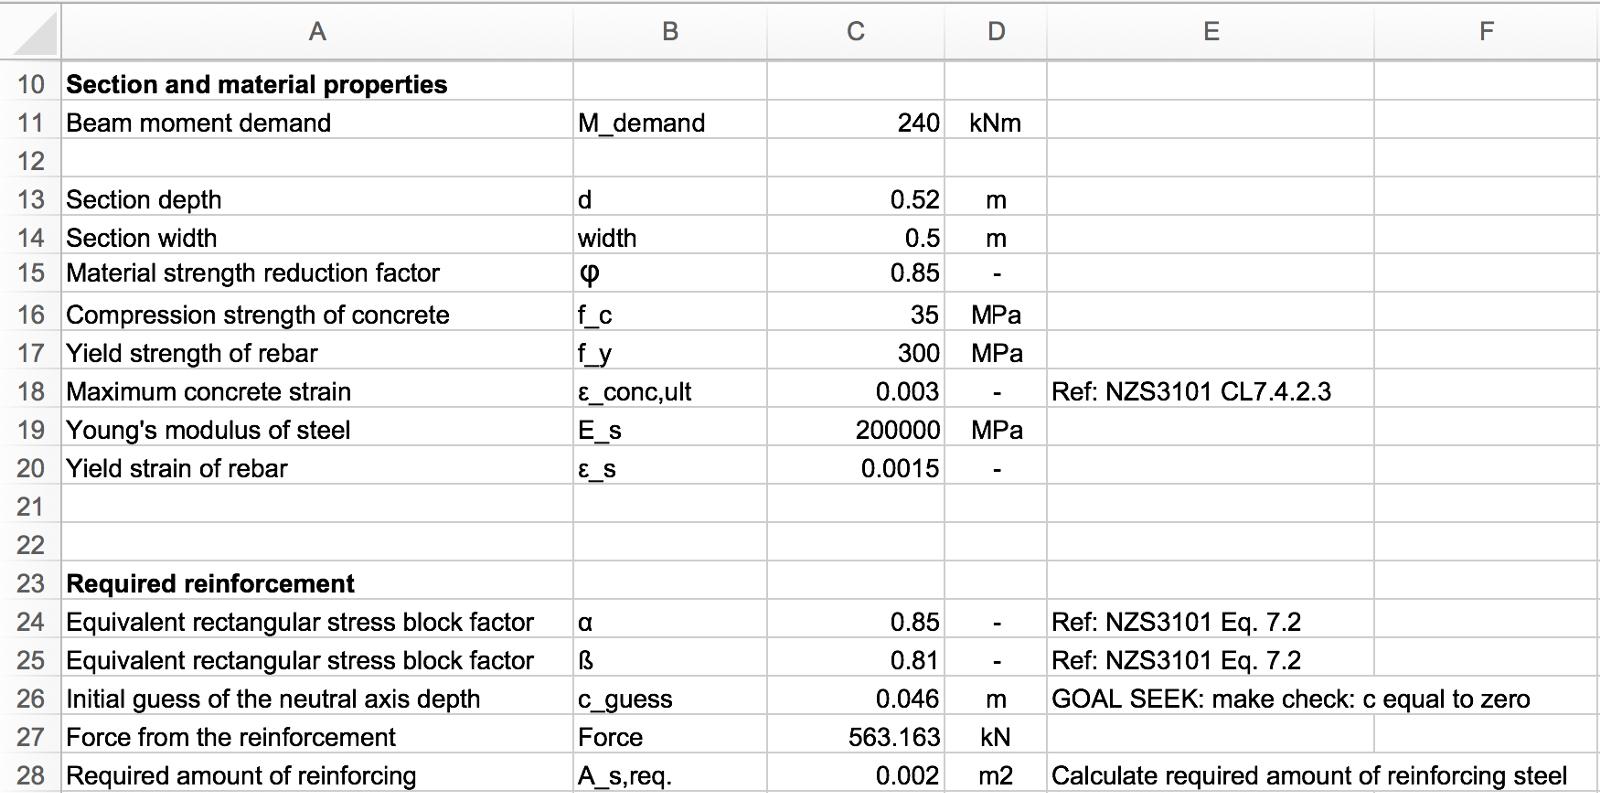 Engineering Spreadsheets Regarding The Do's And Don'ts Of Engineering Spreadsheets – Maxim Millen – Medium